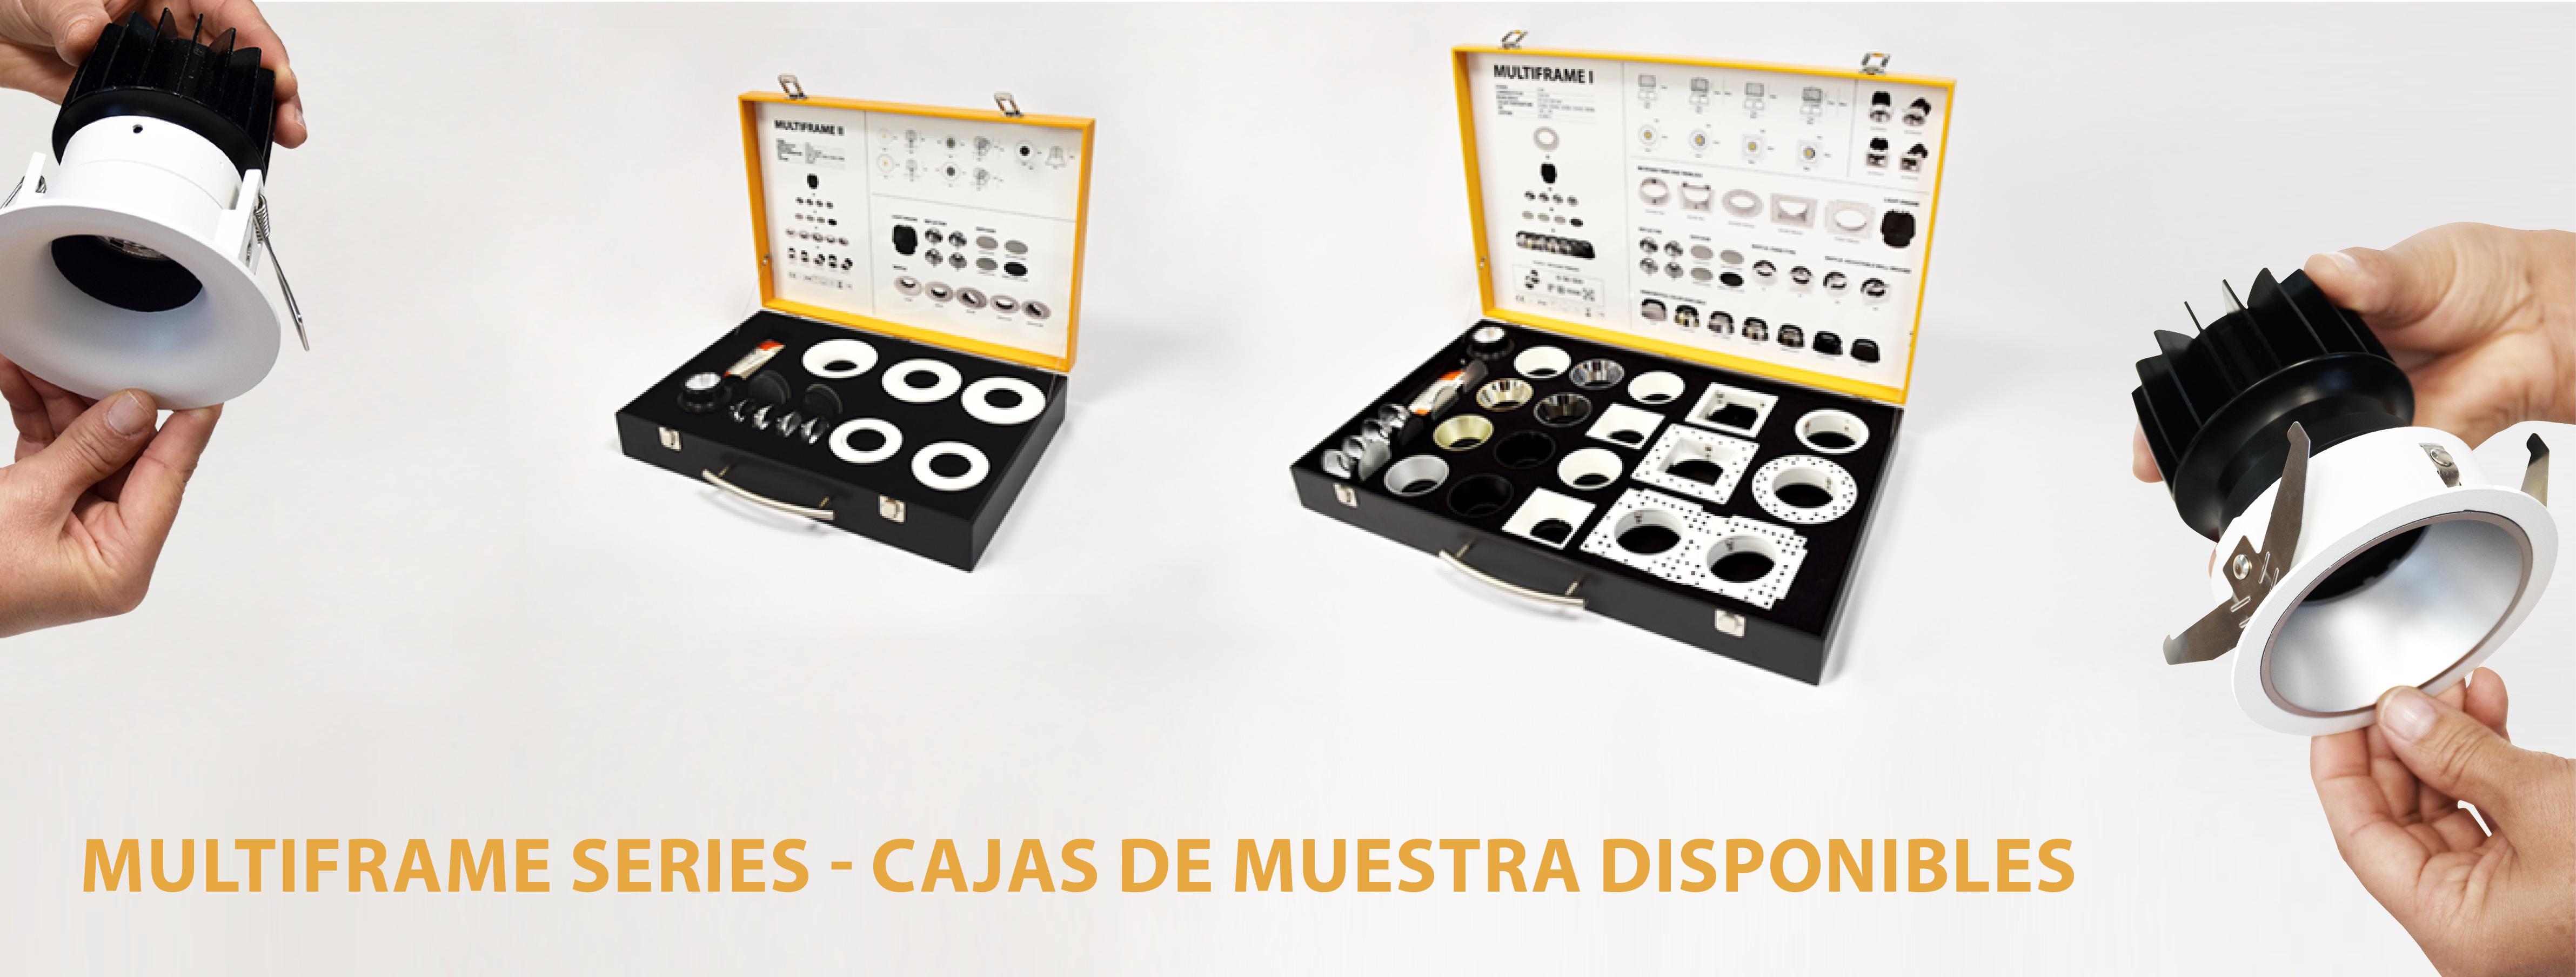 banner_caixas_multiframe_es